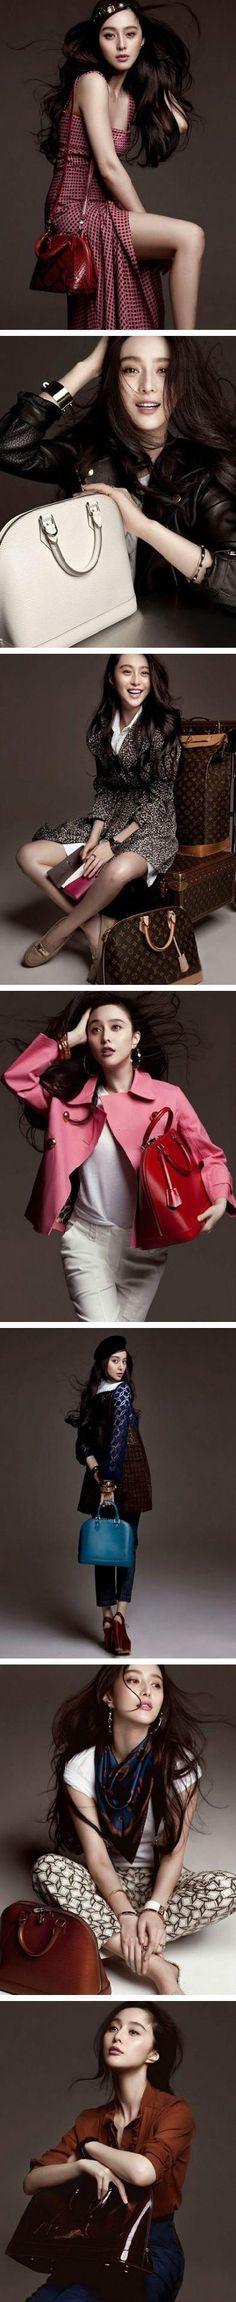 The Alma is my favorite Louis Vuitton handbags - LV Alma. Fan Bingbing, a famous star from China.